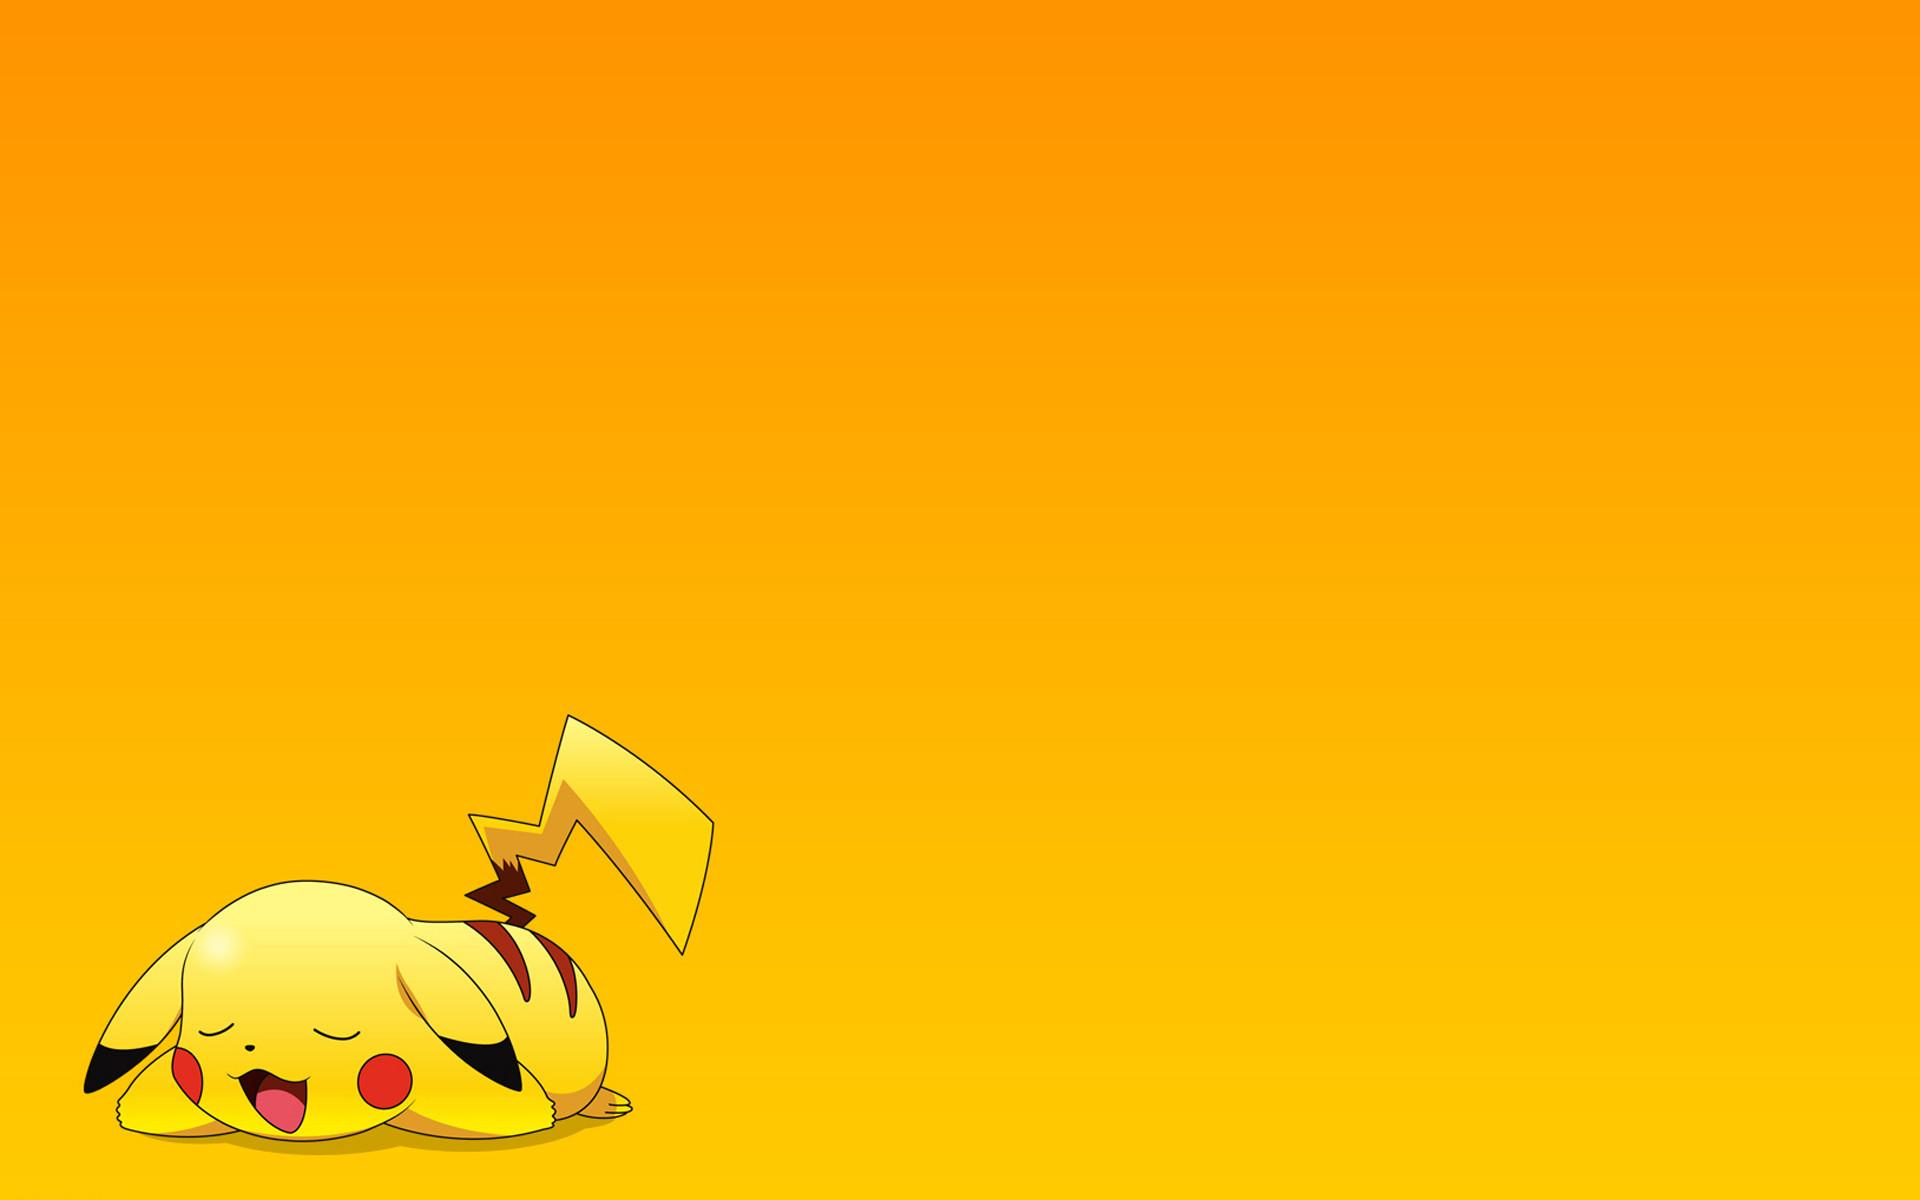 pokemon wallpaper https://newsgaze.com/2015/08/11/